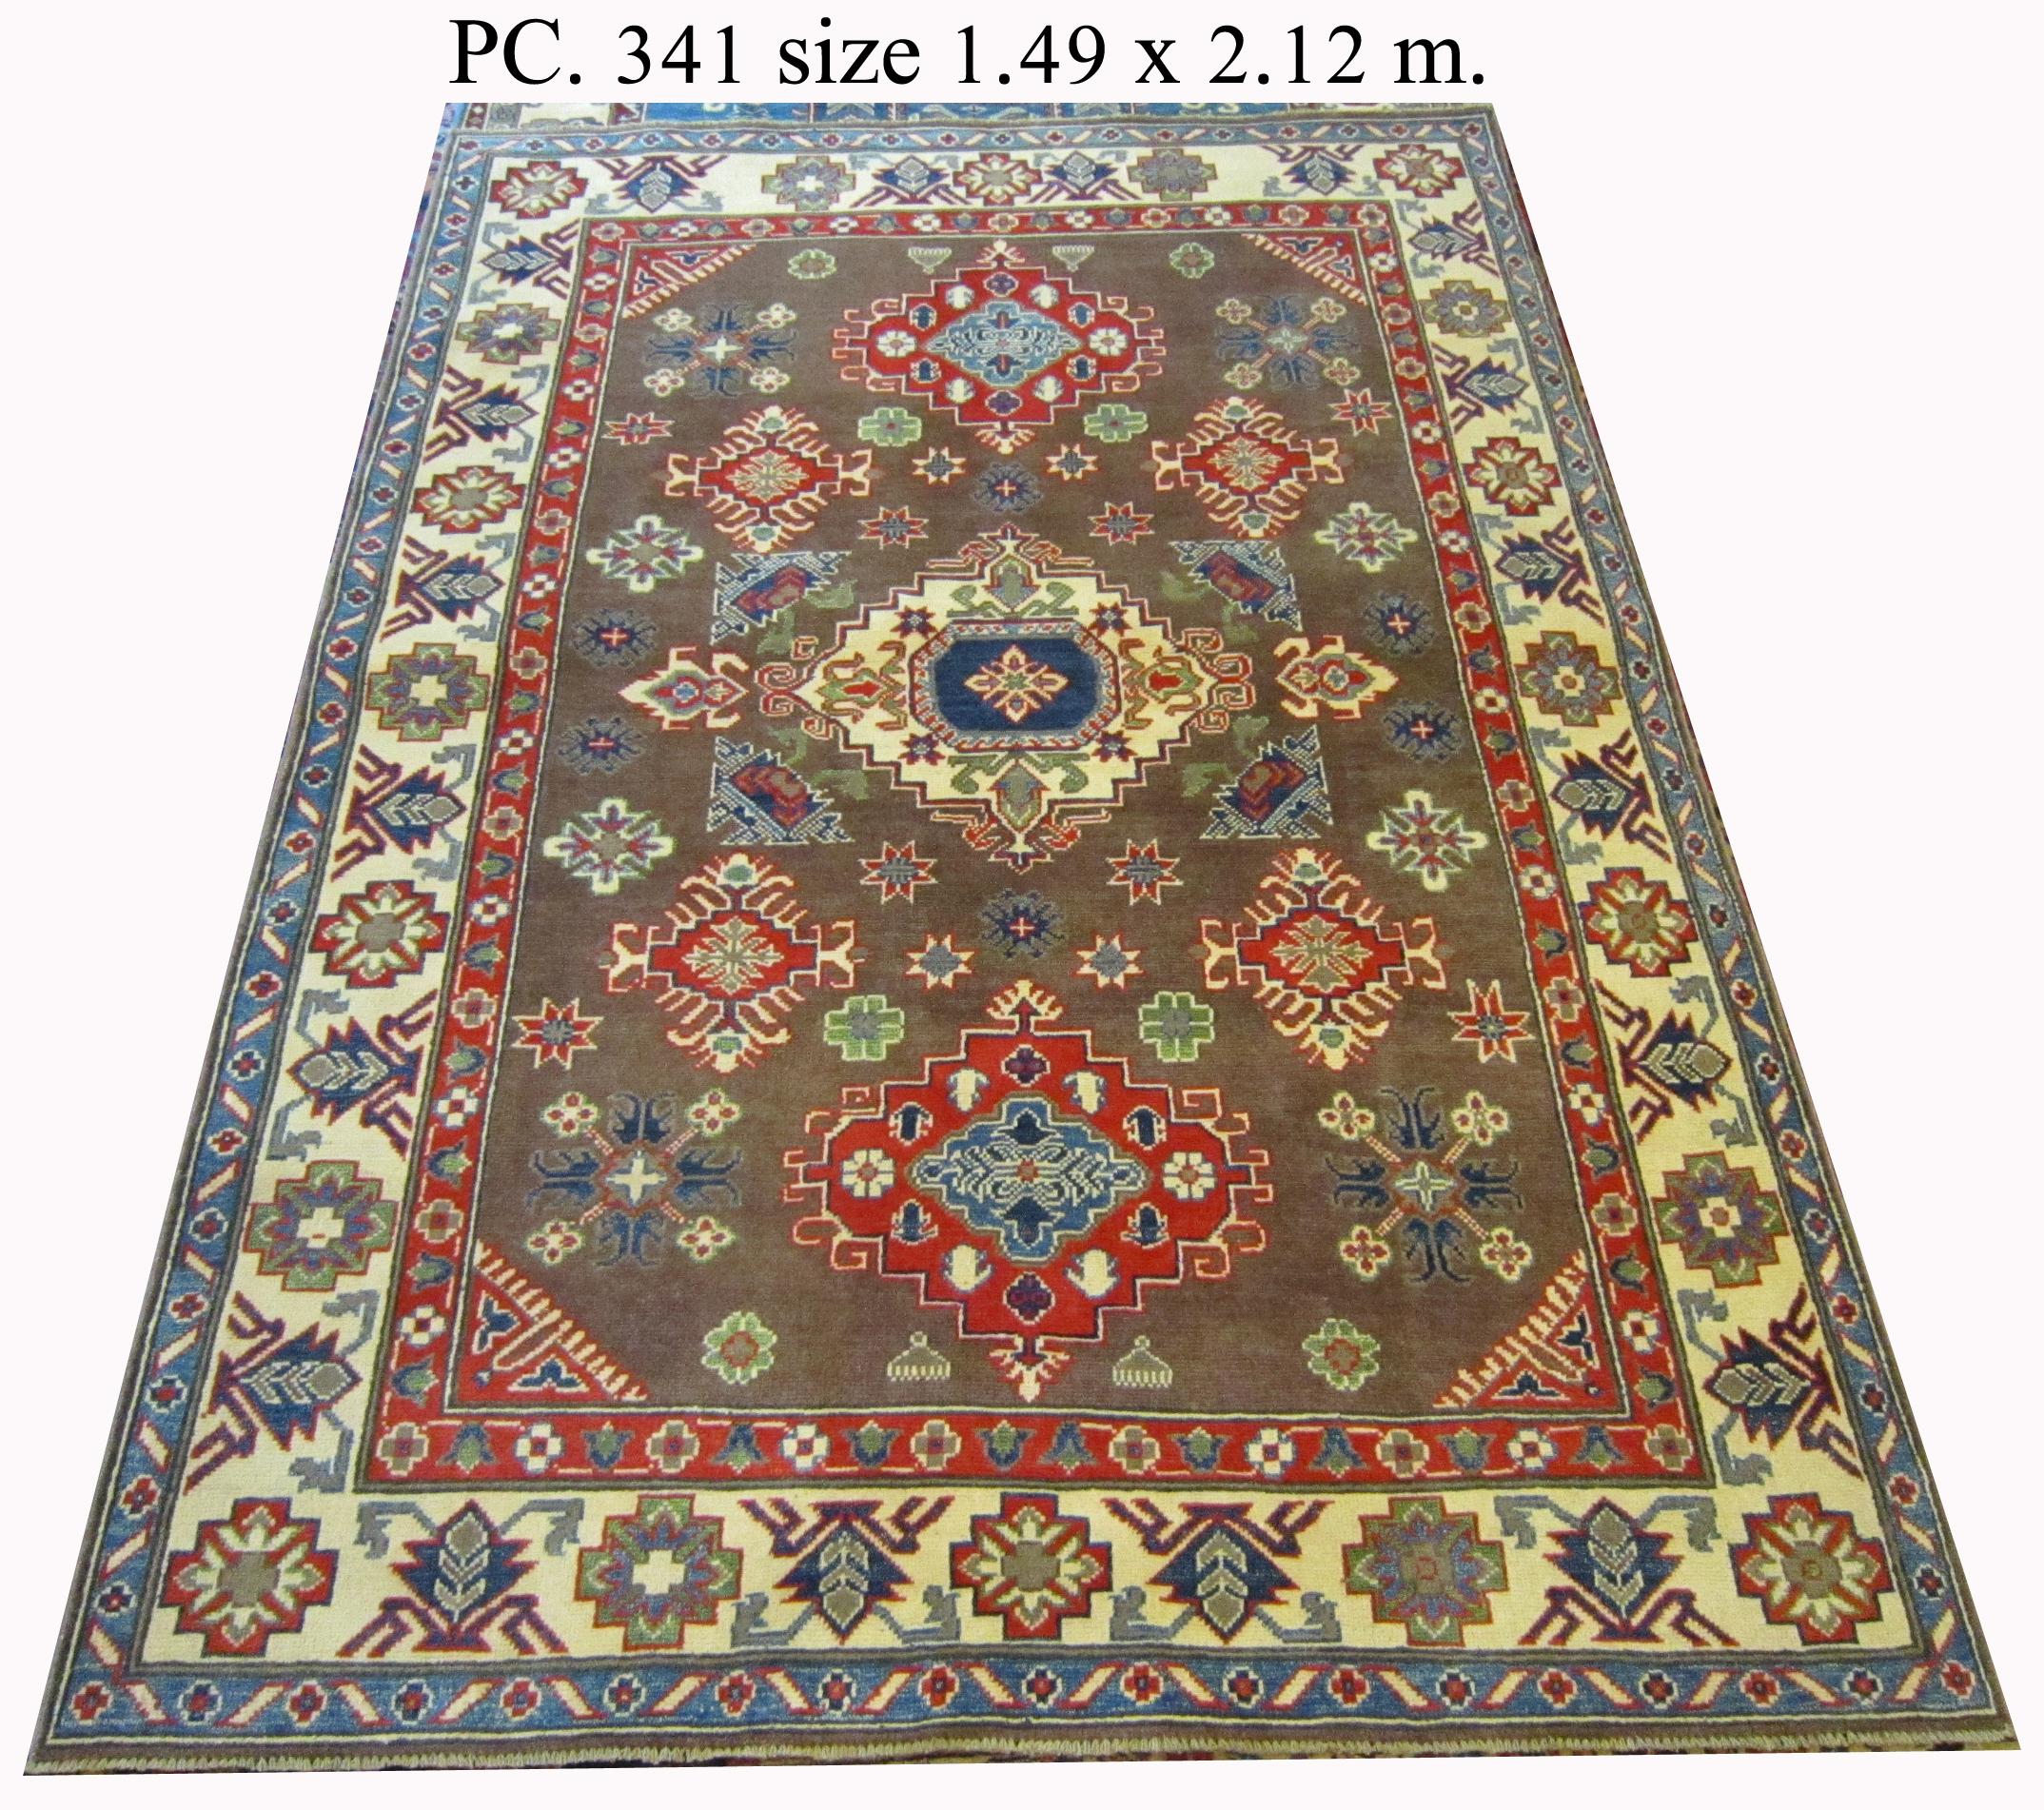 Gallery persian carpets bangkok thailand for Esstisch 2 40 m